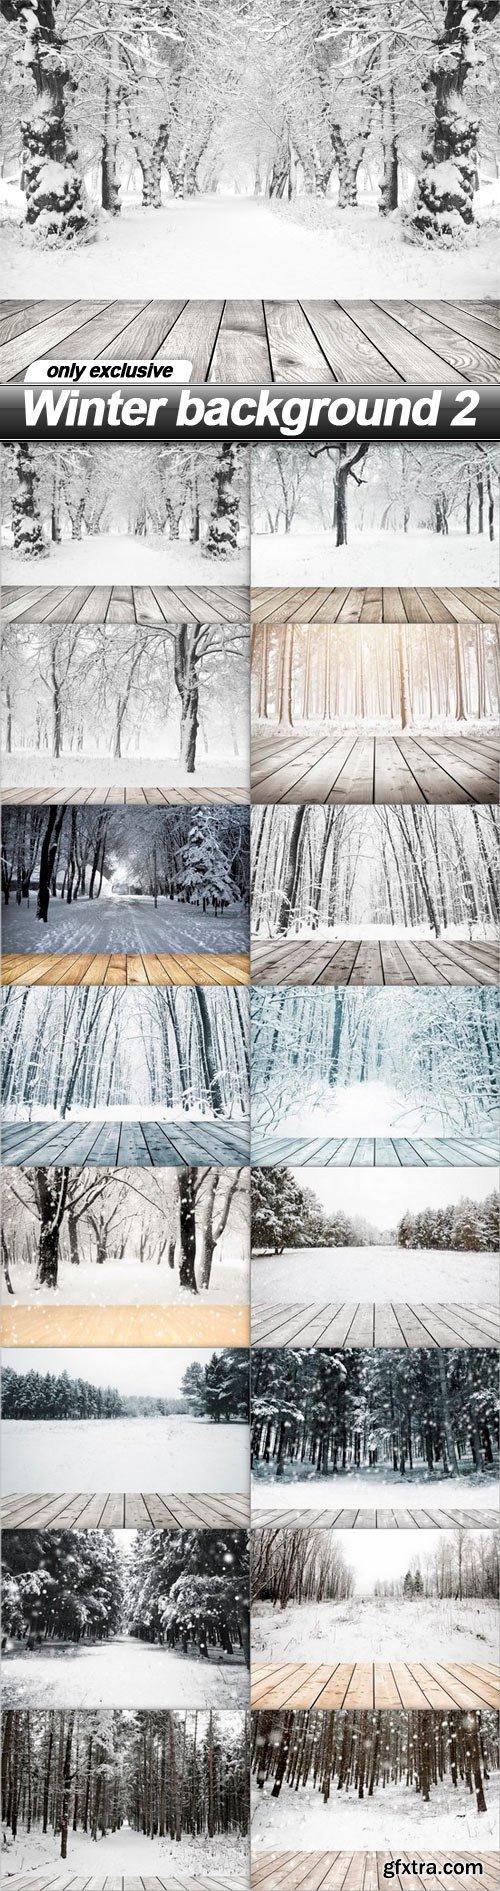 Winter background 2 - 16 UHQ JPEG